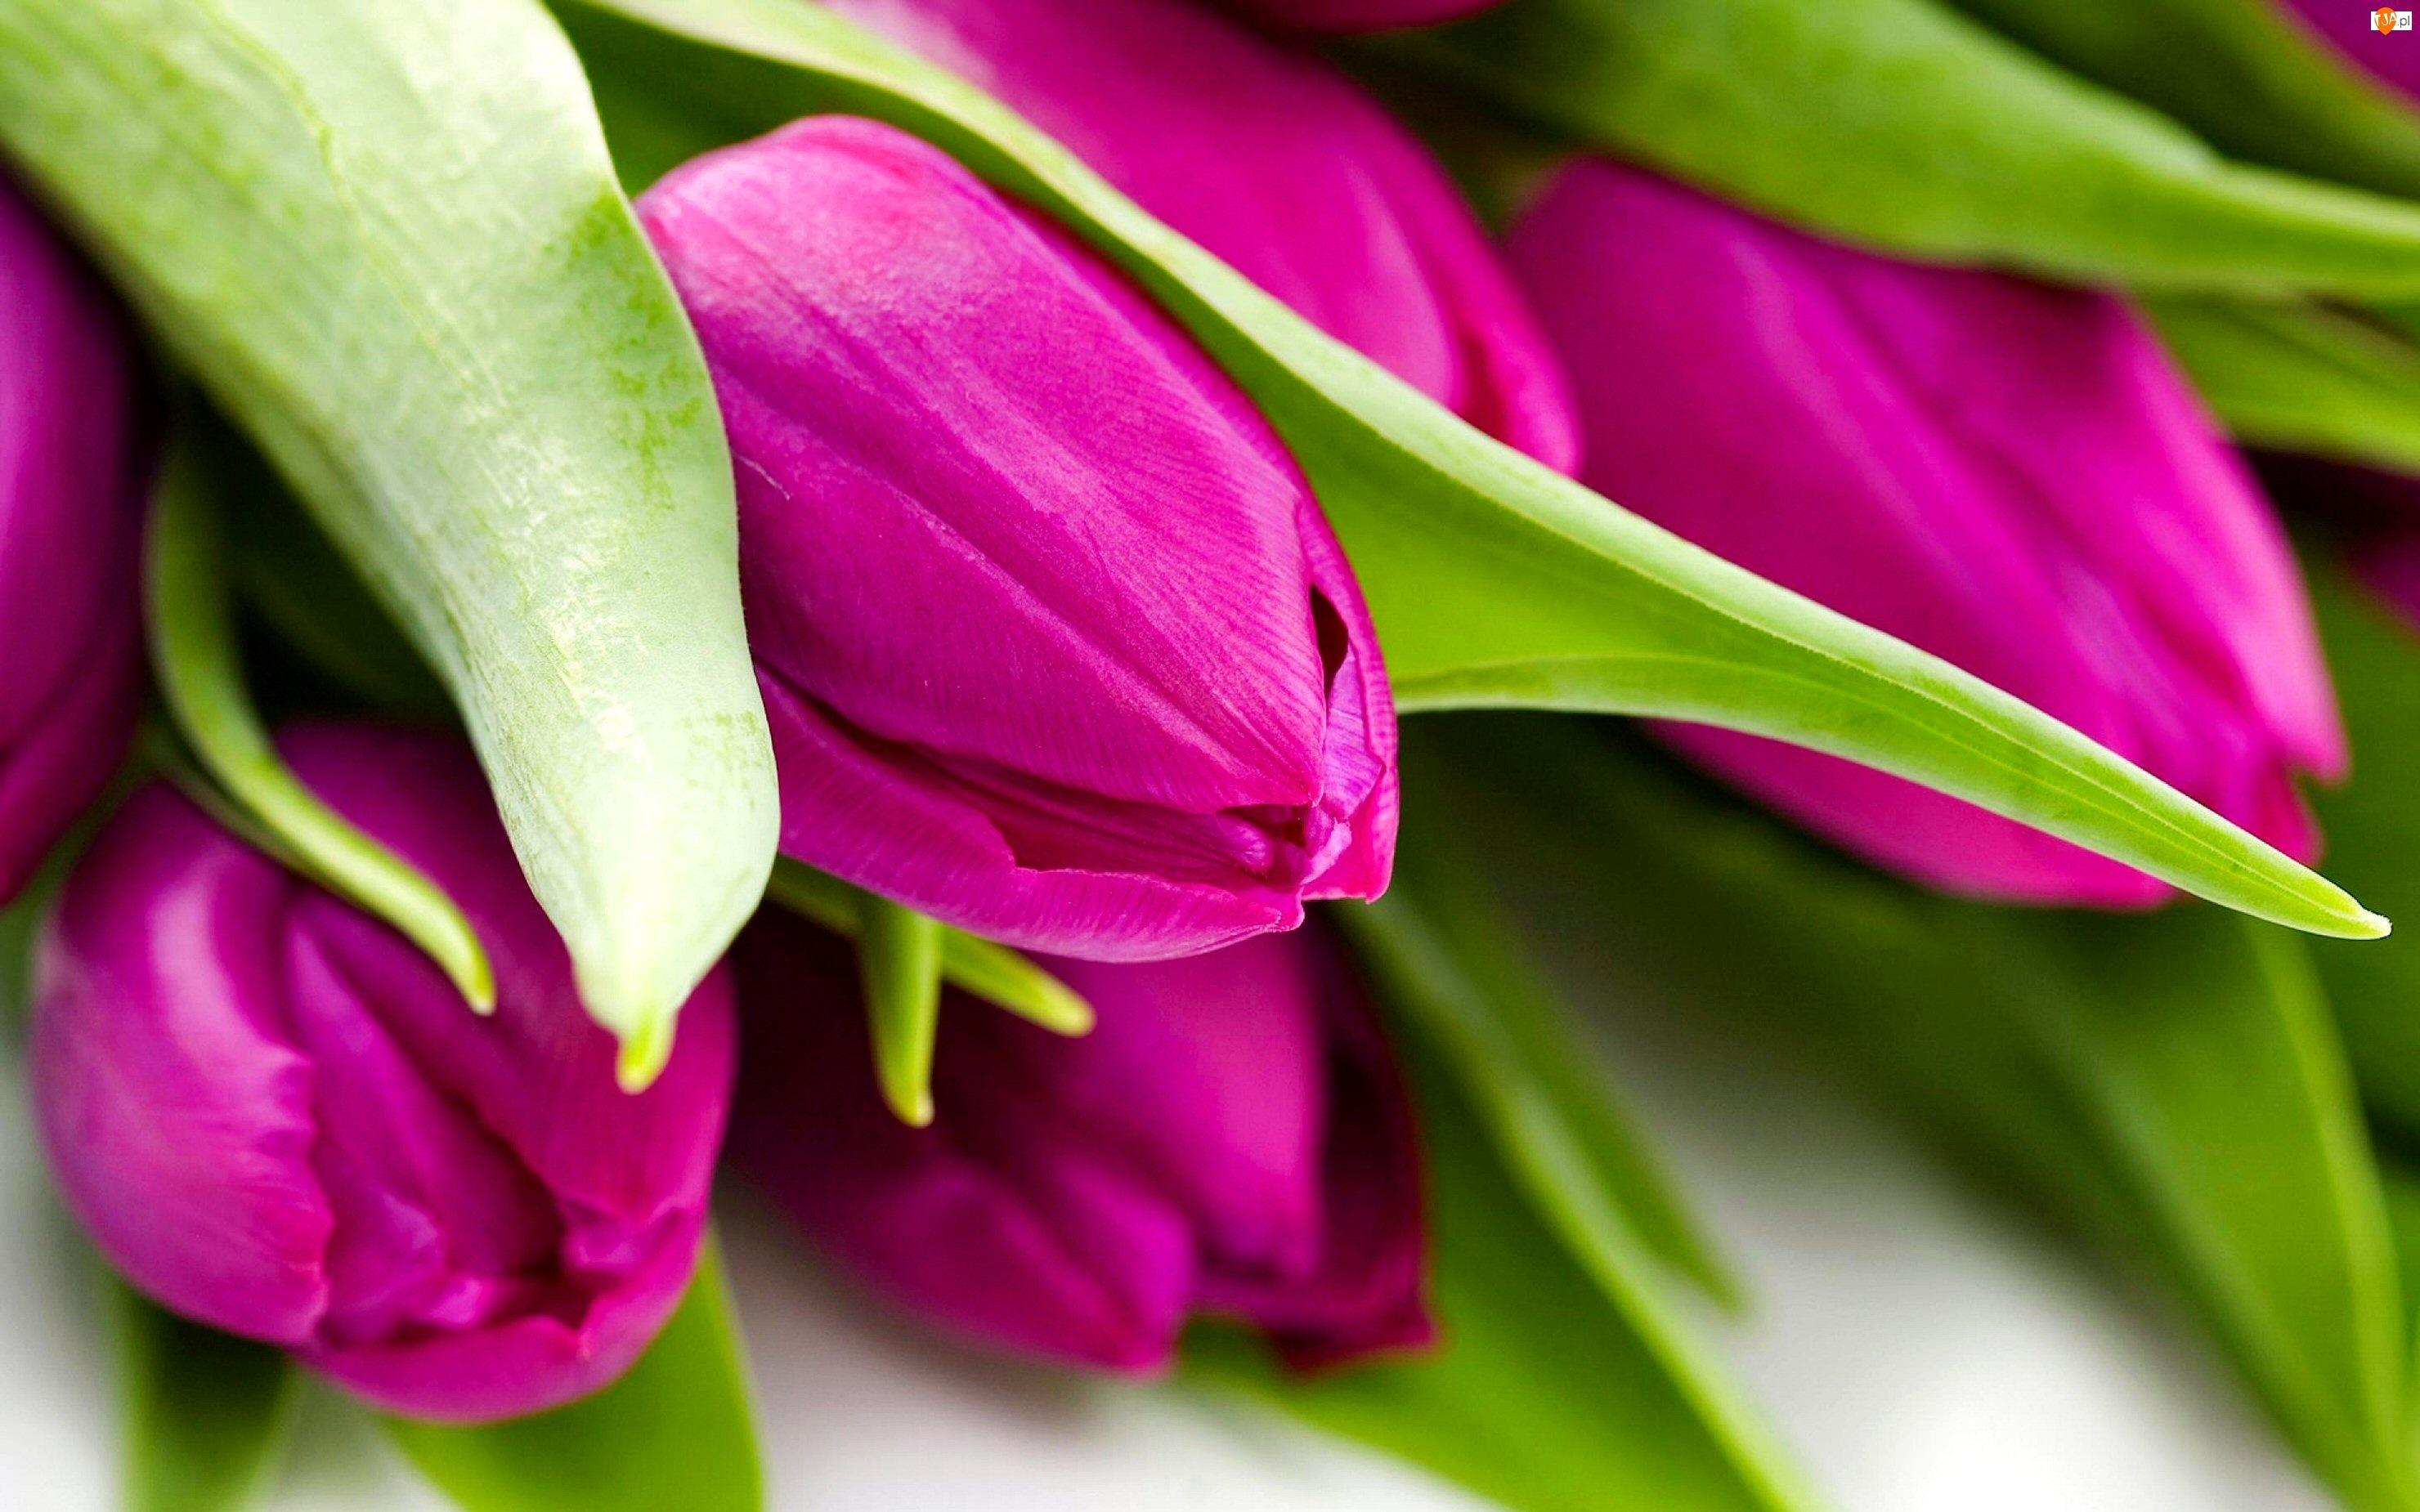 Fioletowe, Tulipany